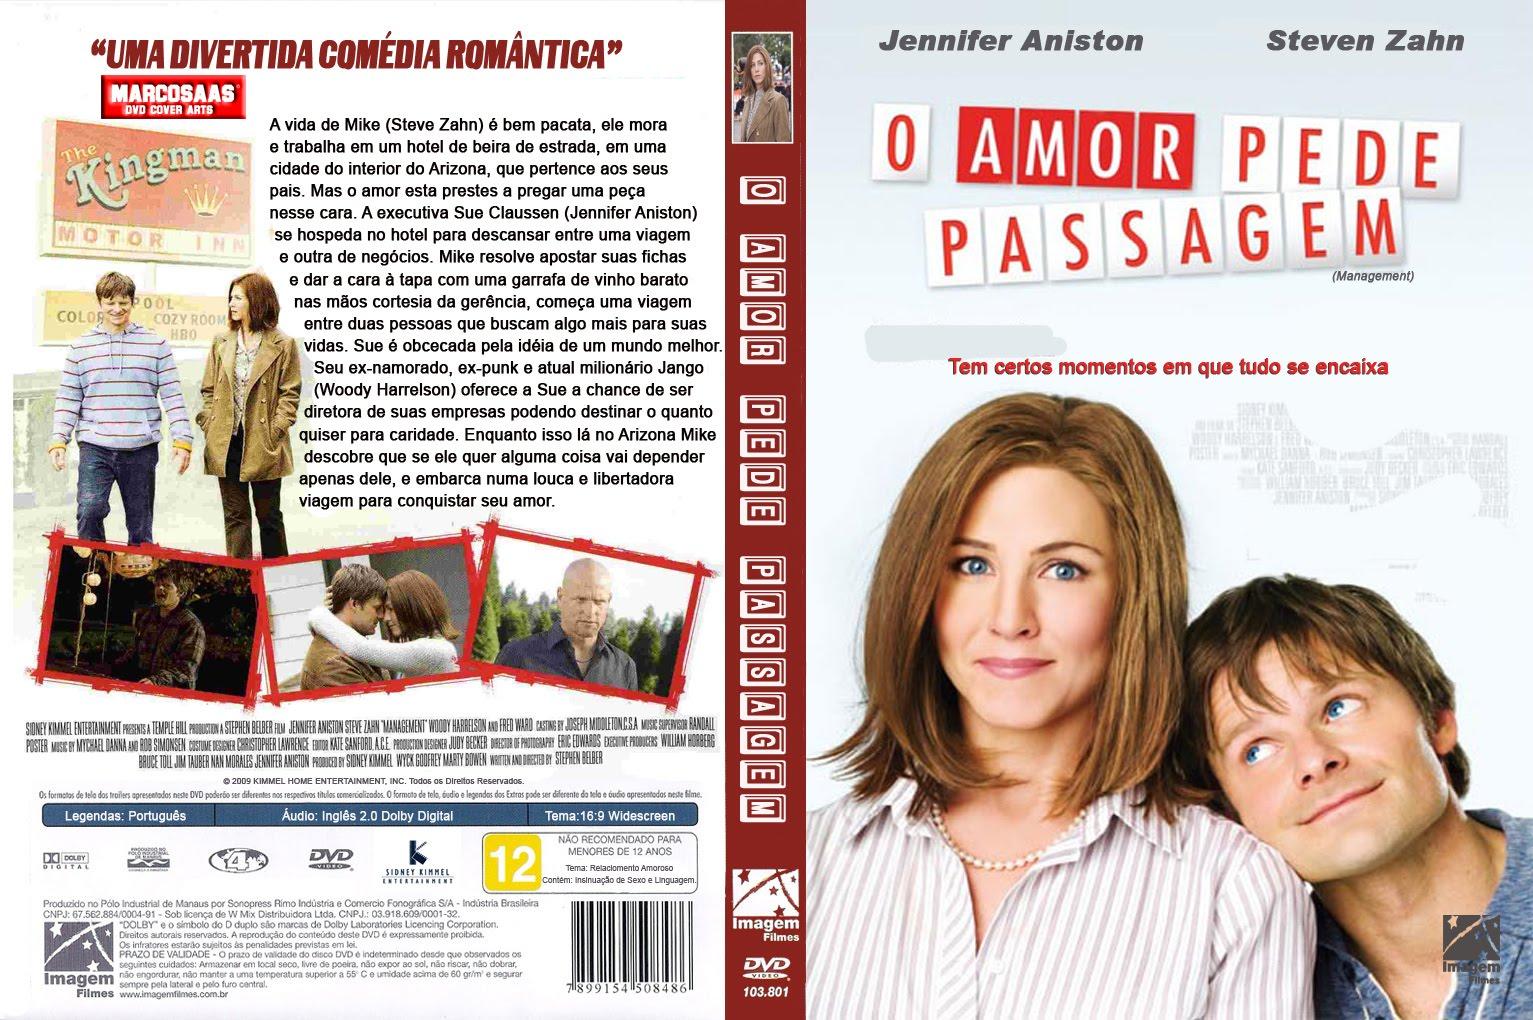 http://2.bp.blogspot.com/_UIkyBpFTkN0/TDyrxbHCJOI/AAAAAAAAAL4/v9l0Phu1vNU/s1600/O+Amor+Pede+Passagem_.jpg